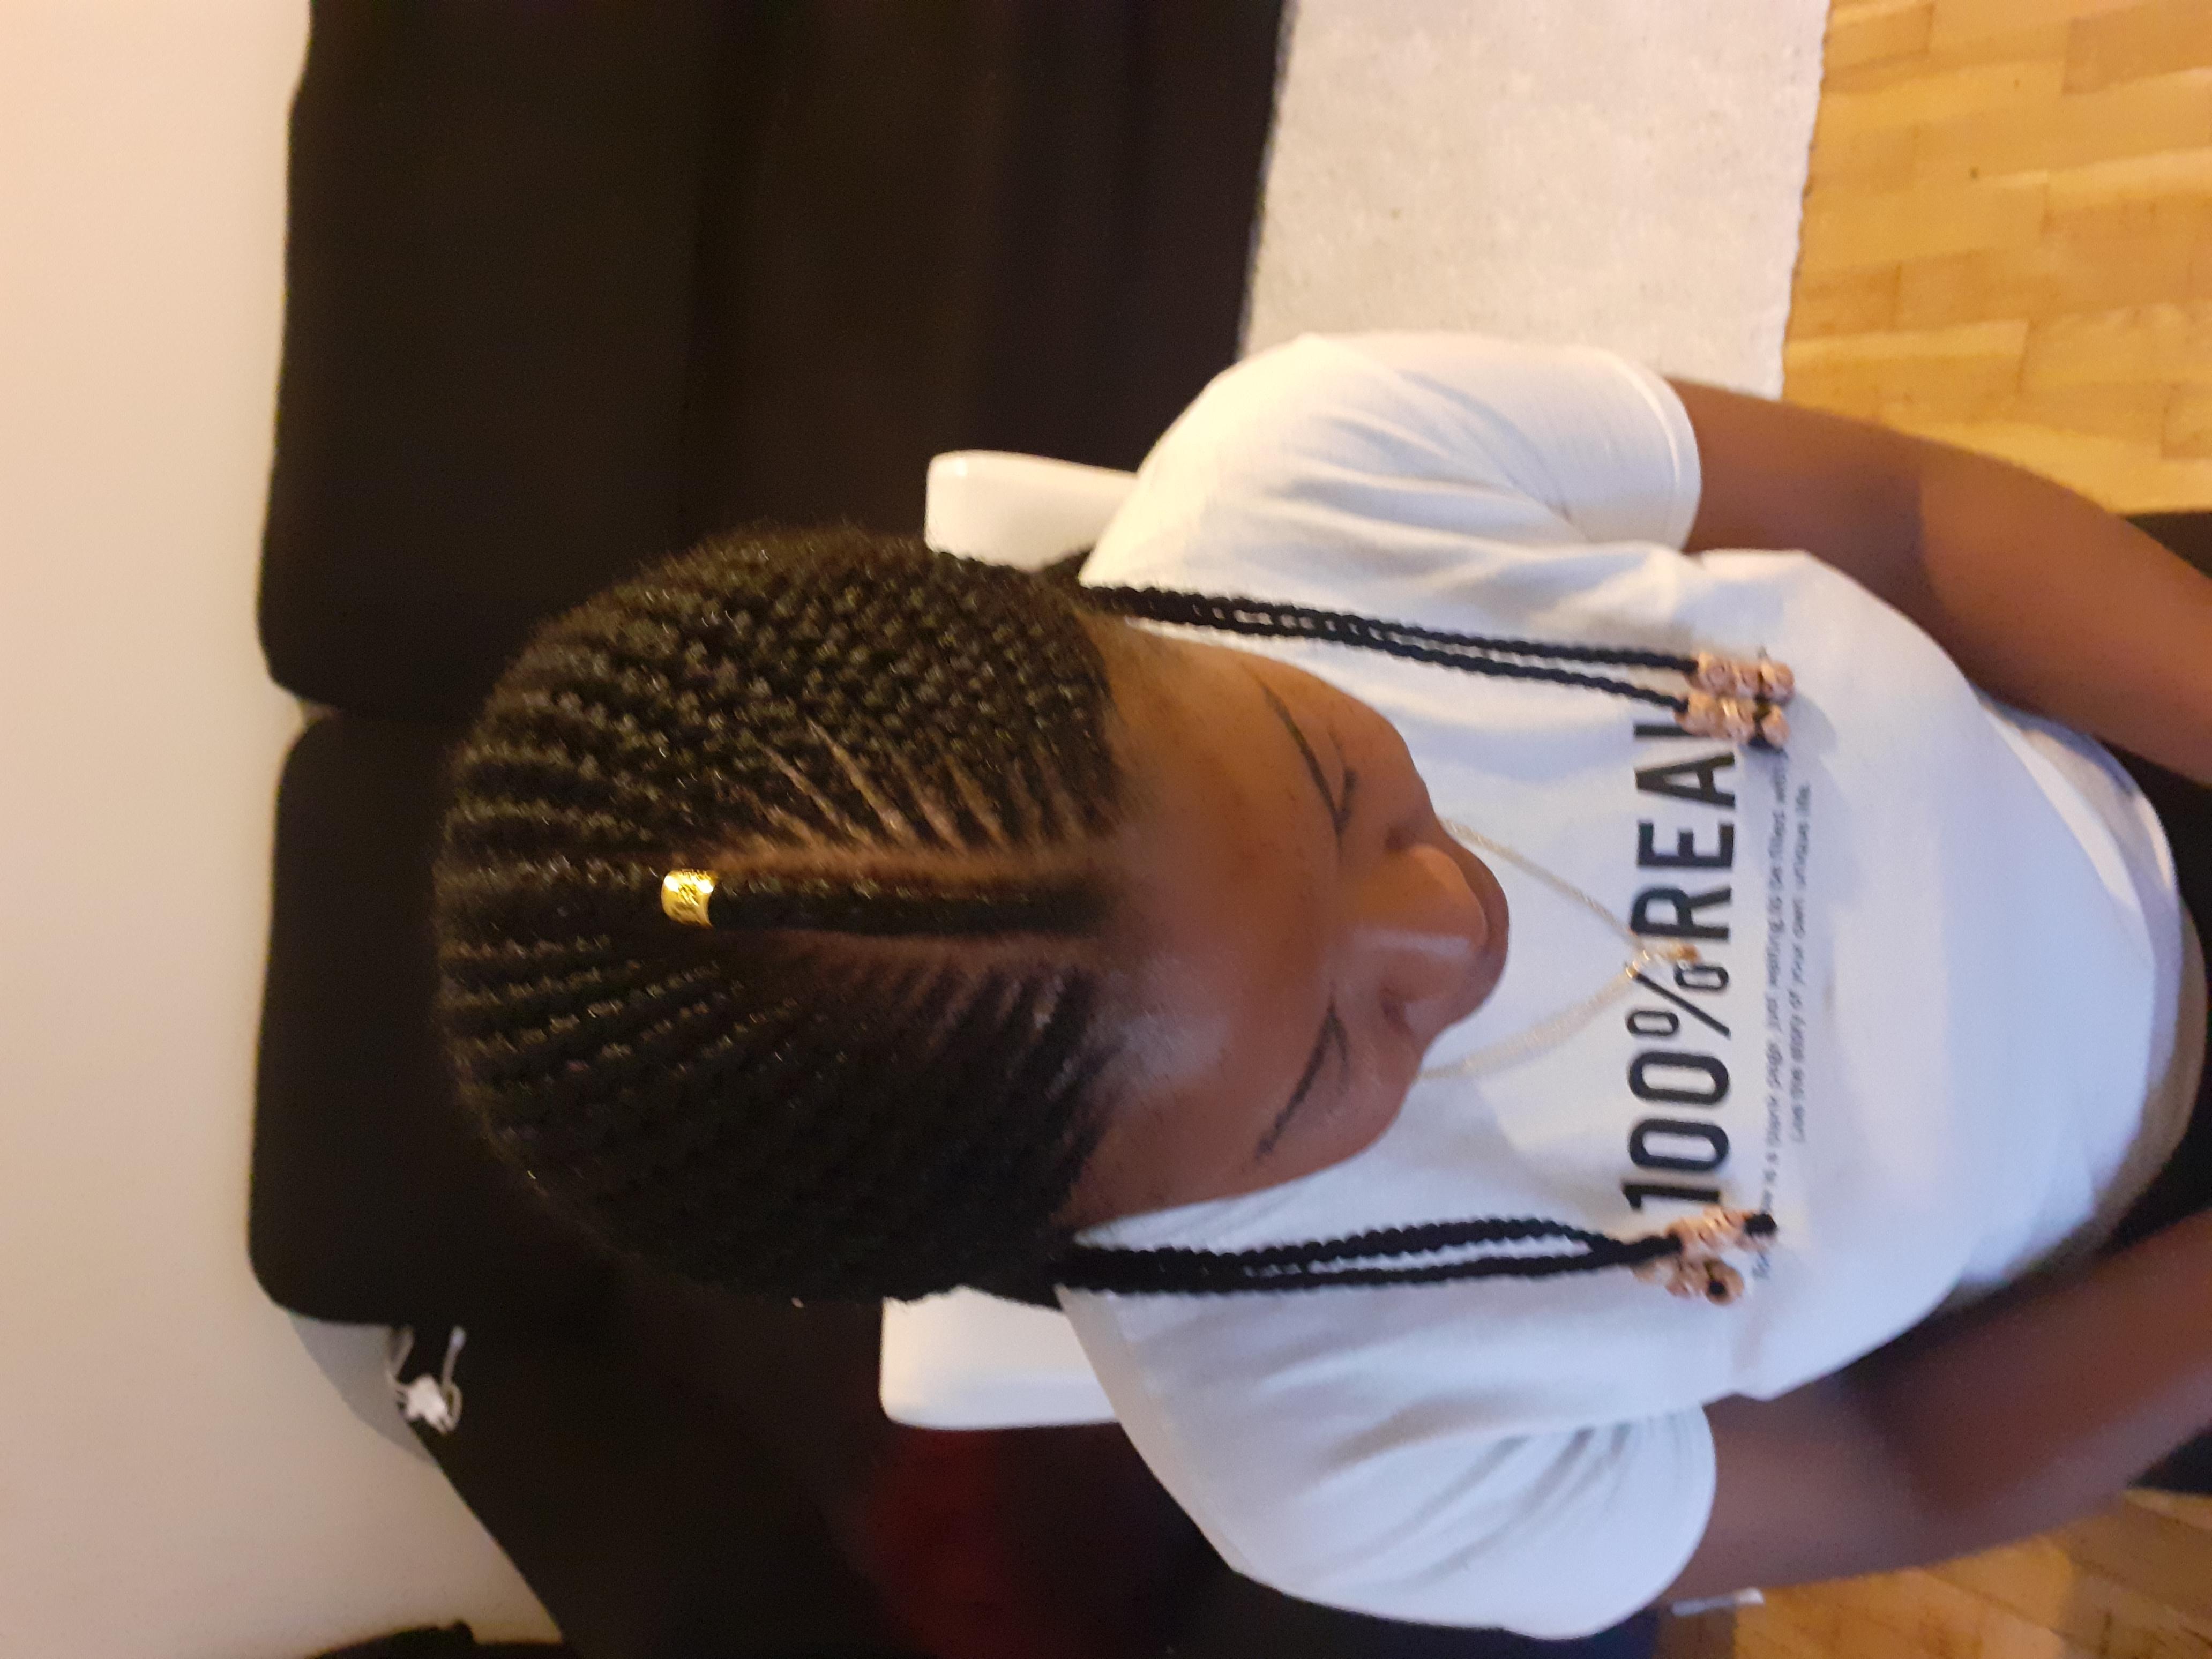 salon de coiffure afro tresse tresses box braids crochet braids vanilles tissages paris 75 77 78 91 92 93 94 95 YJSBRBAA